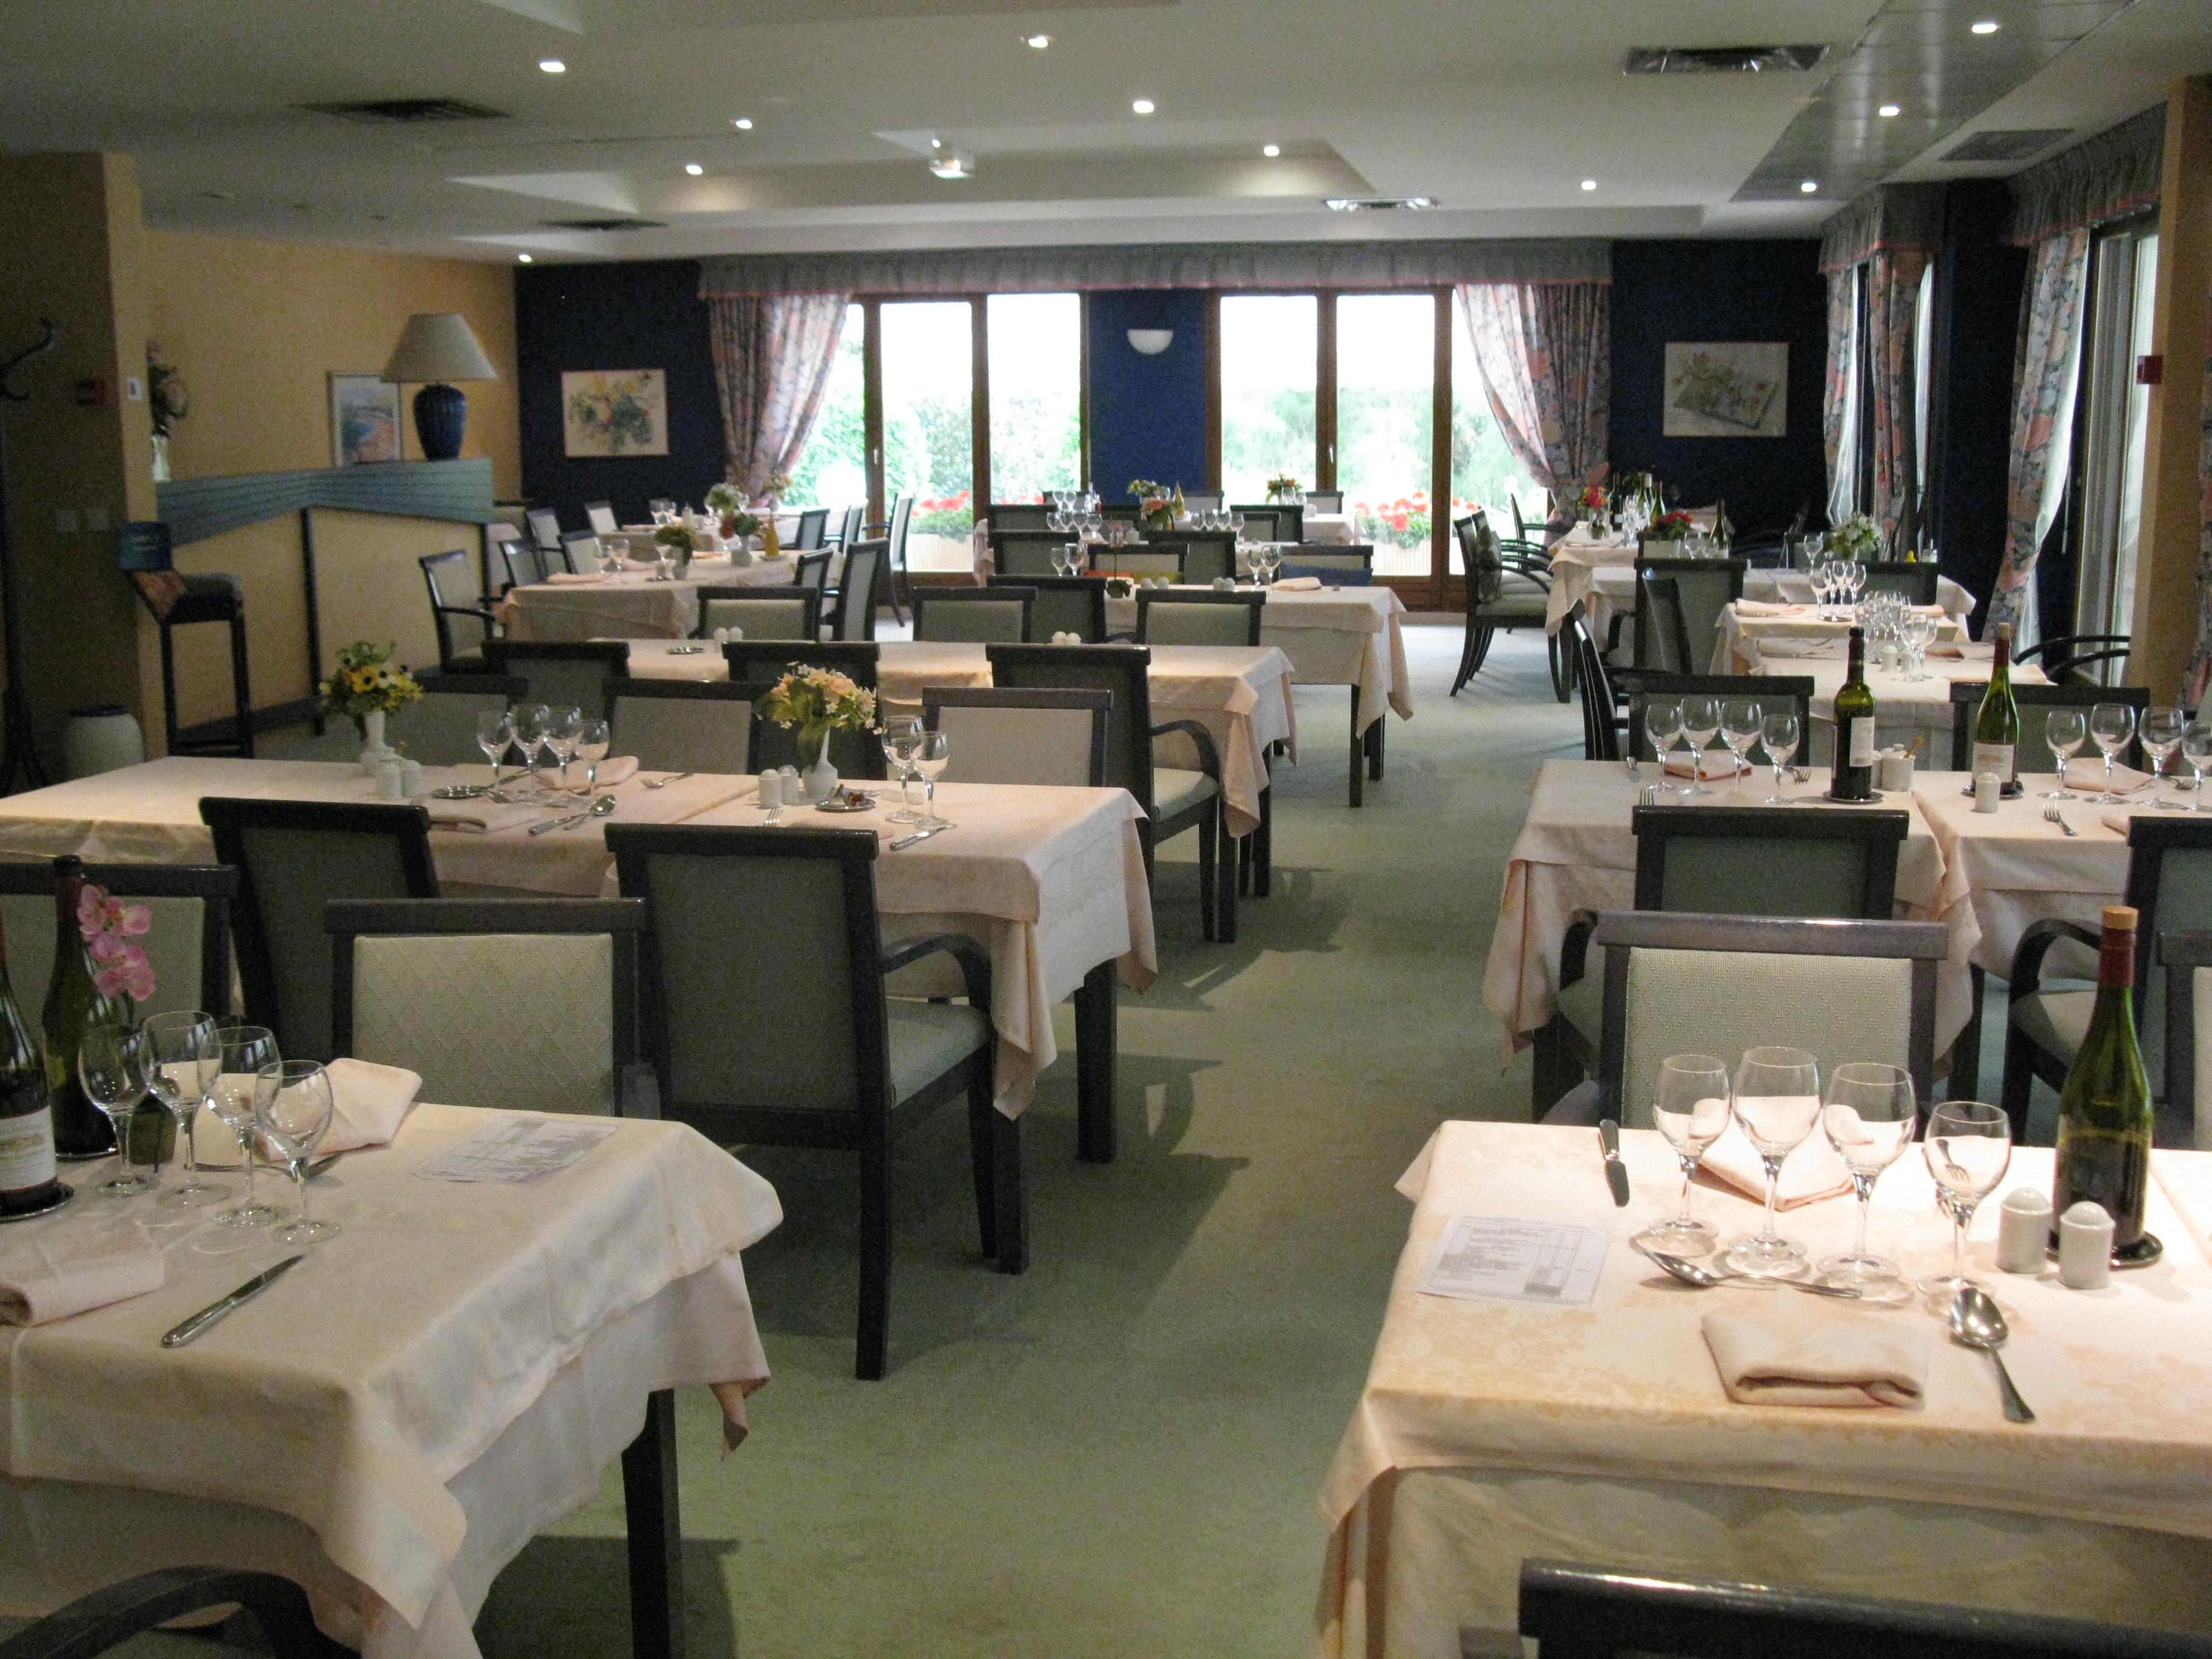 Le restaurant jardins d 39 arcadie for Restaurant a lasalle